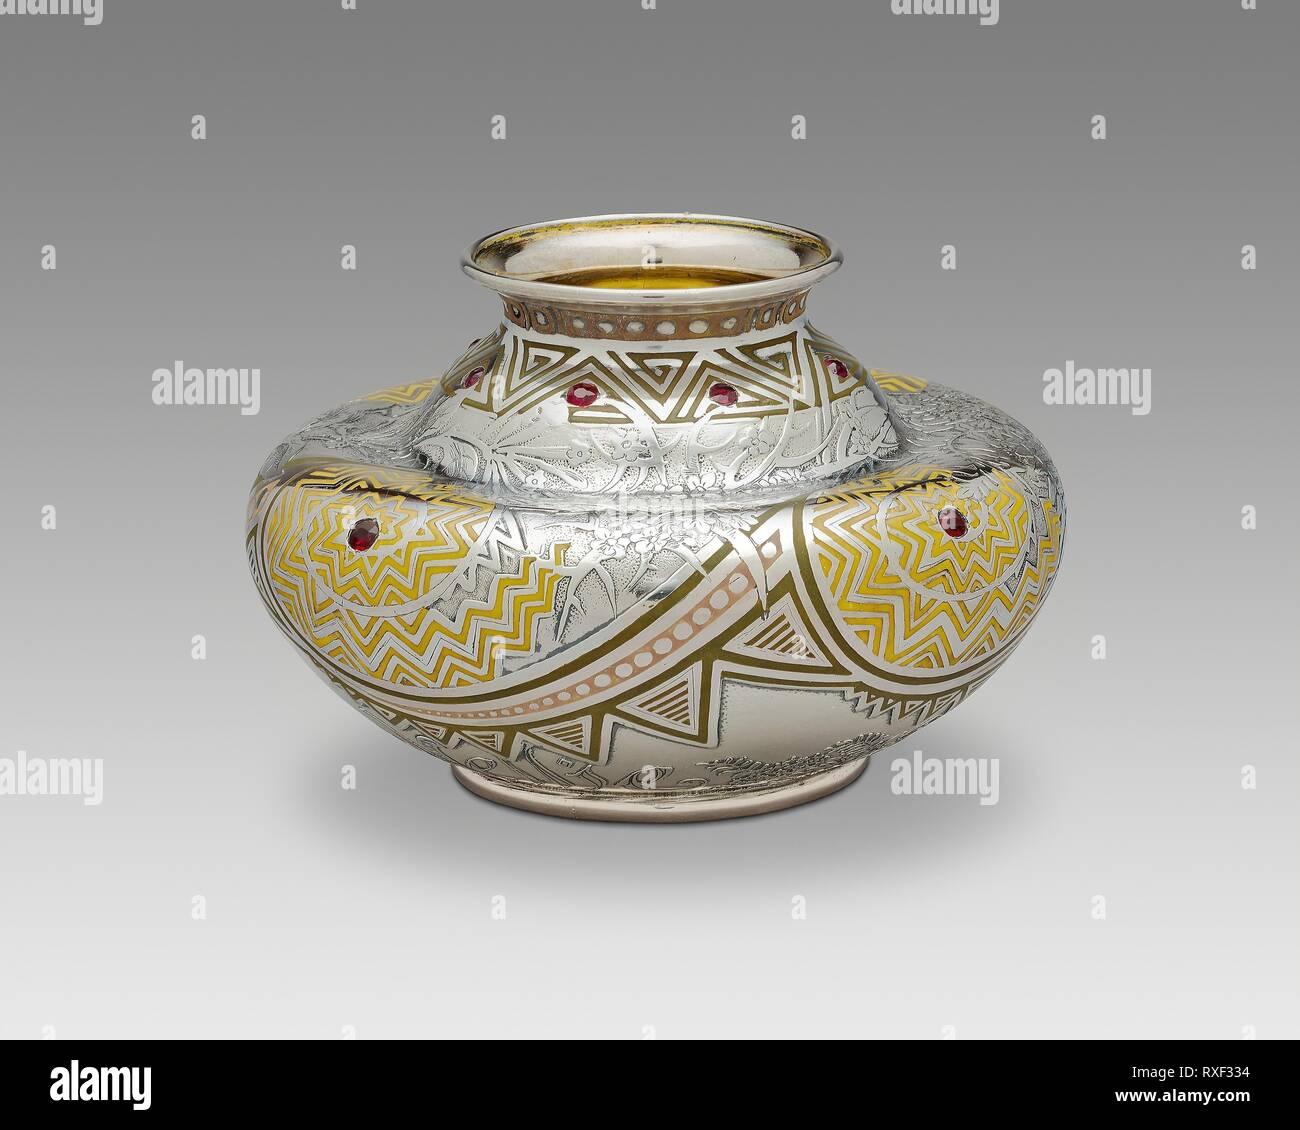 datazione Tiffany argento Sterling